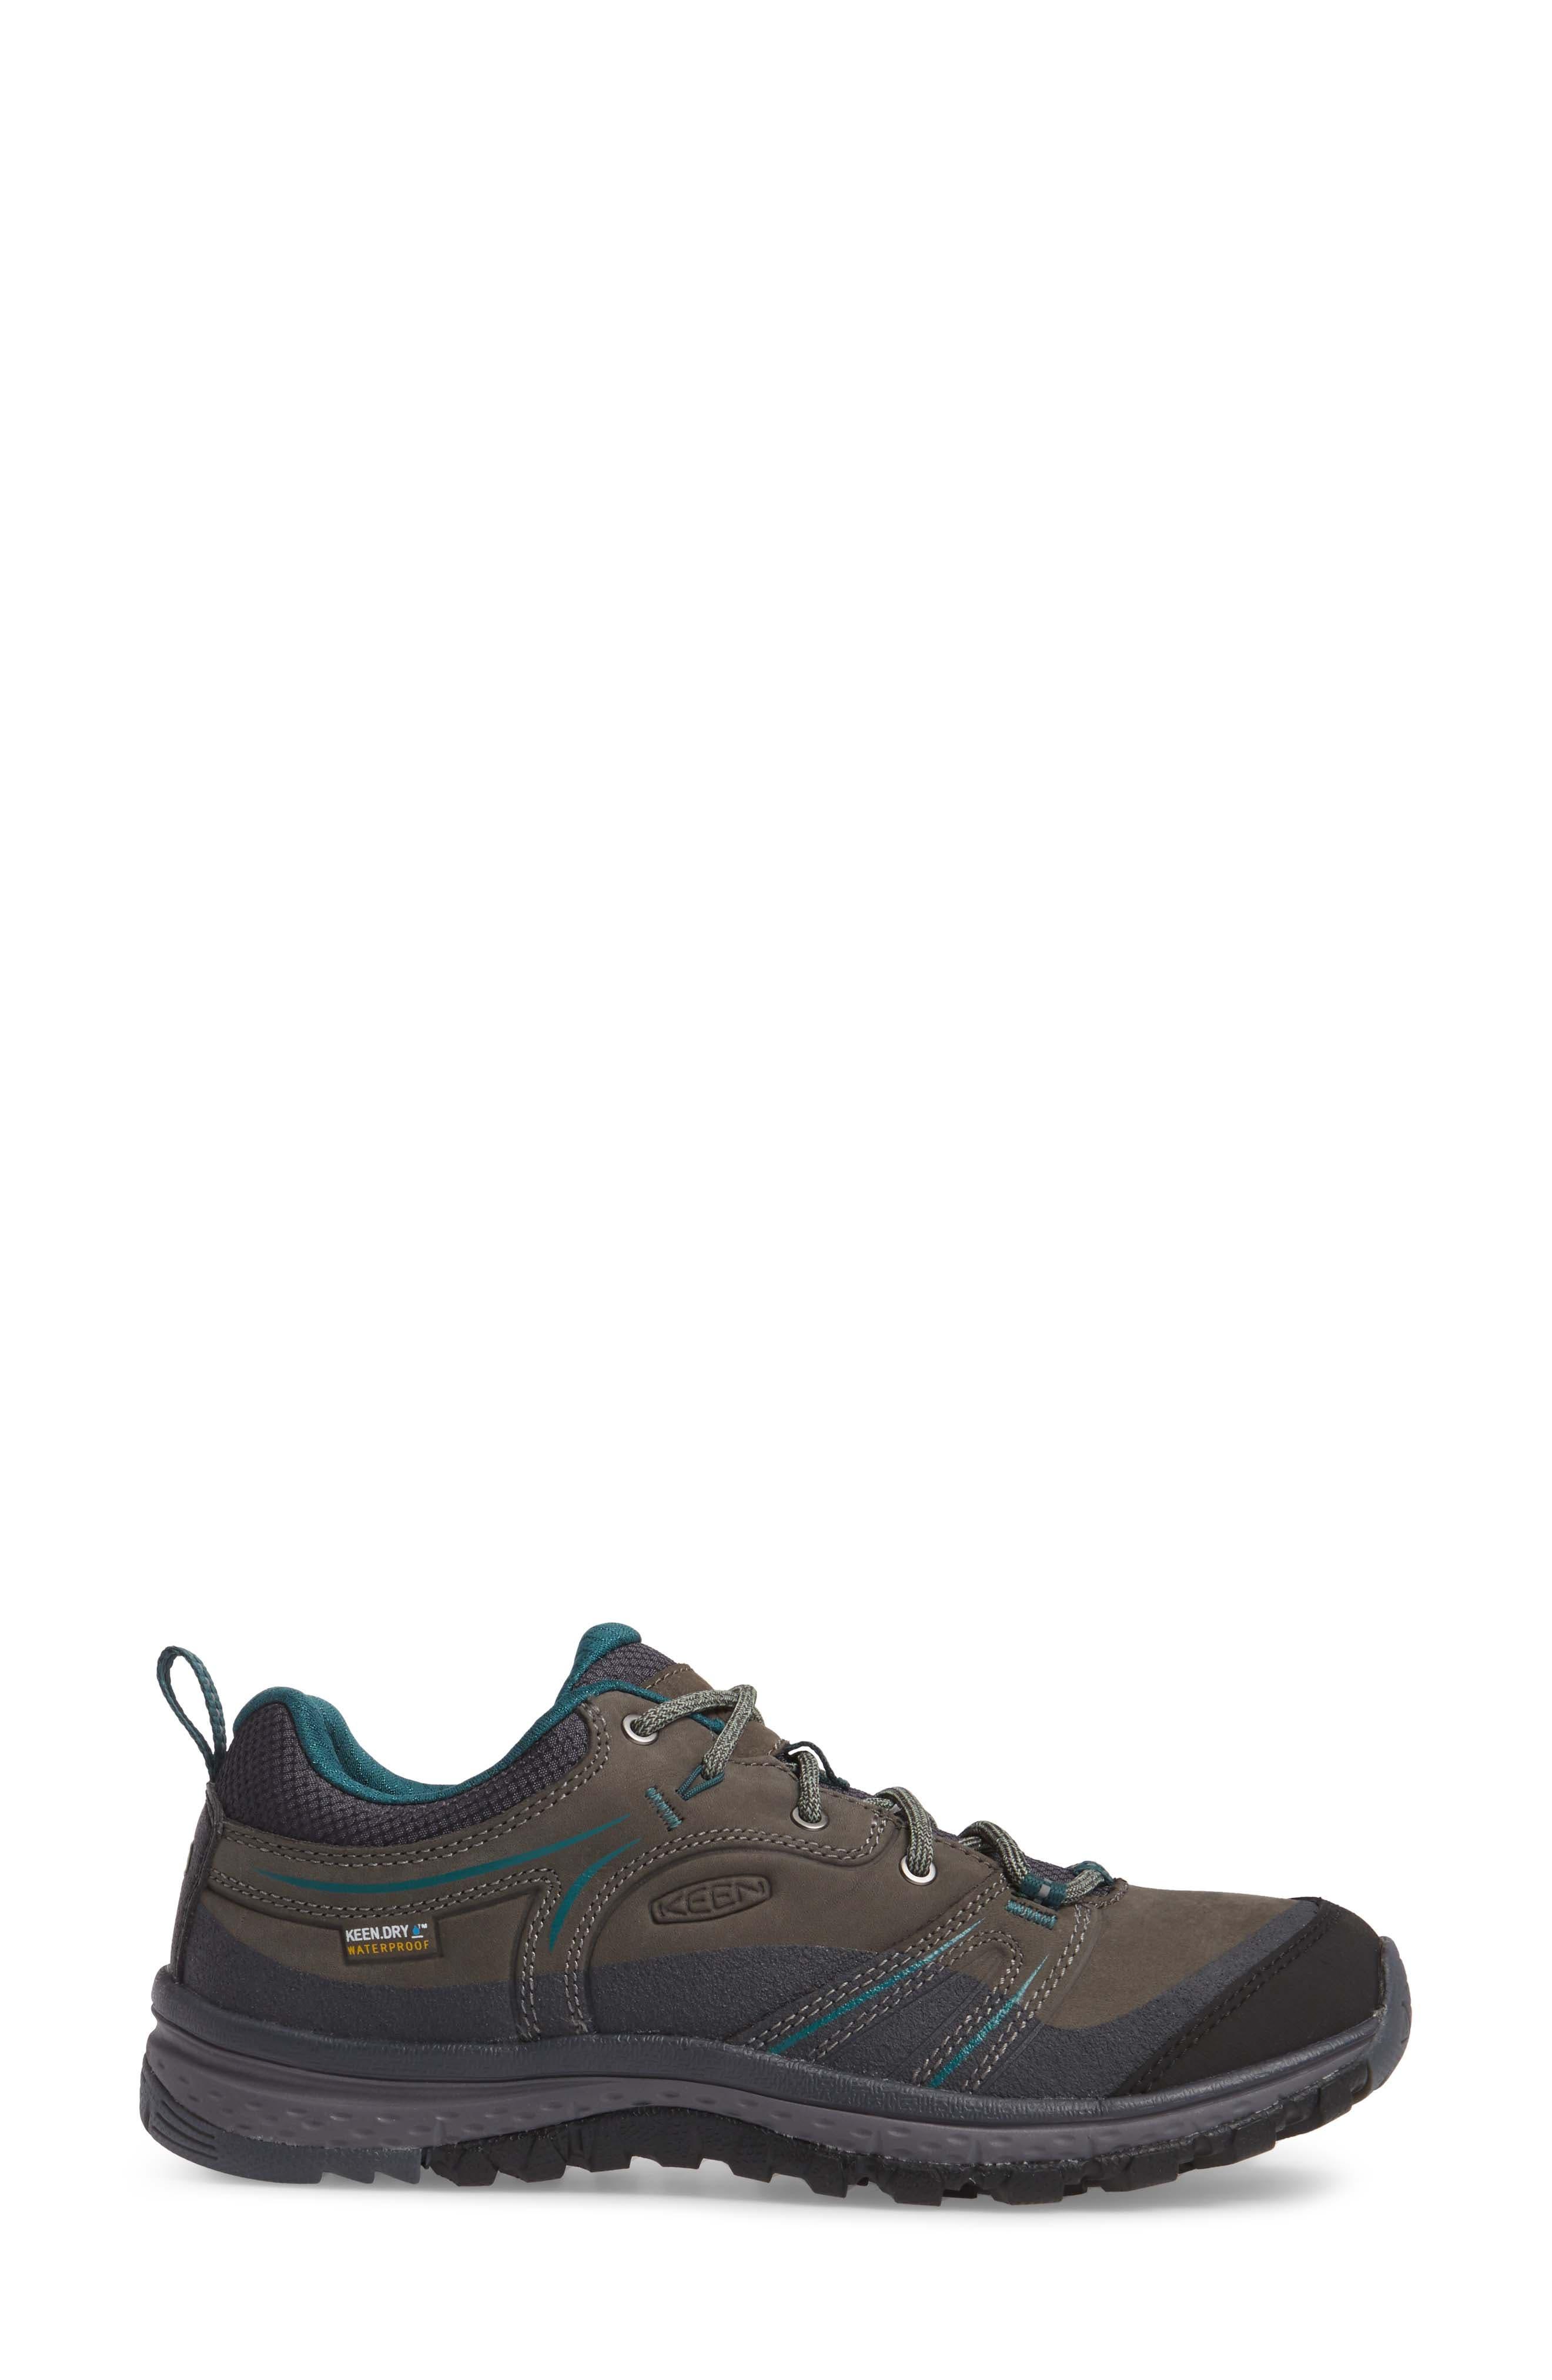 Terradora Waterproof Hiking Shoe,                             Alternate thumbnail 8, color,